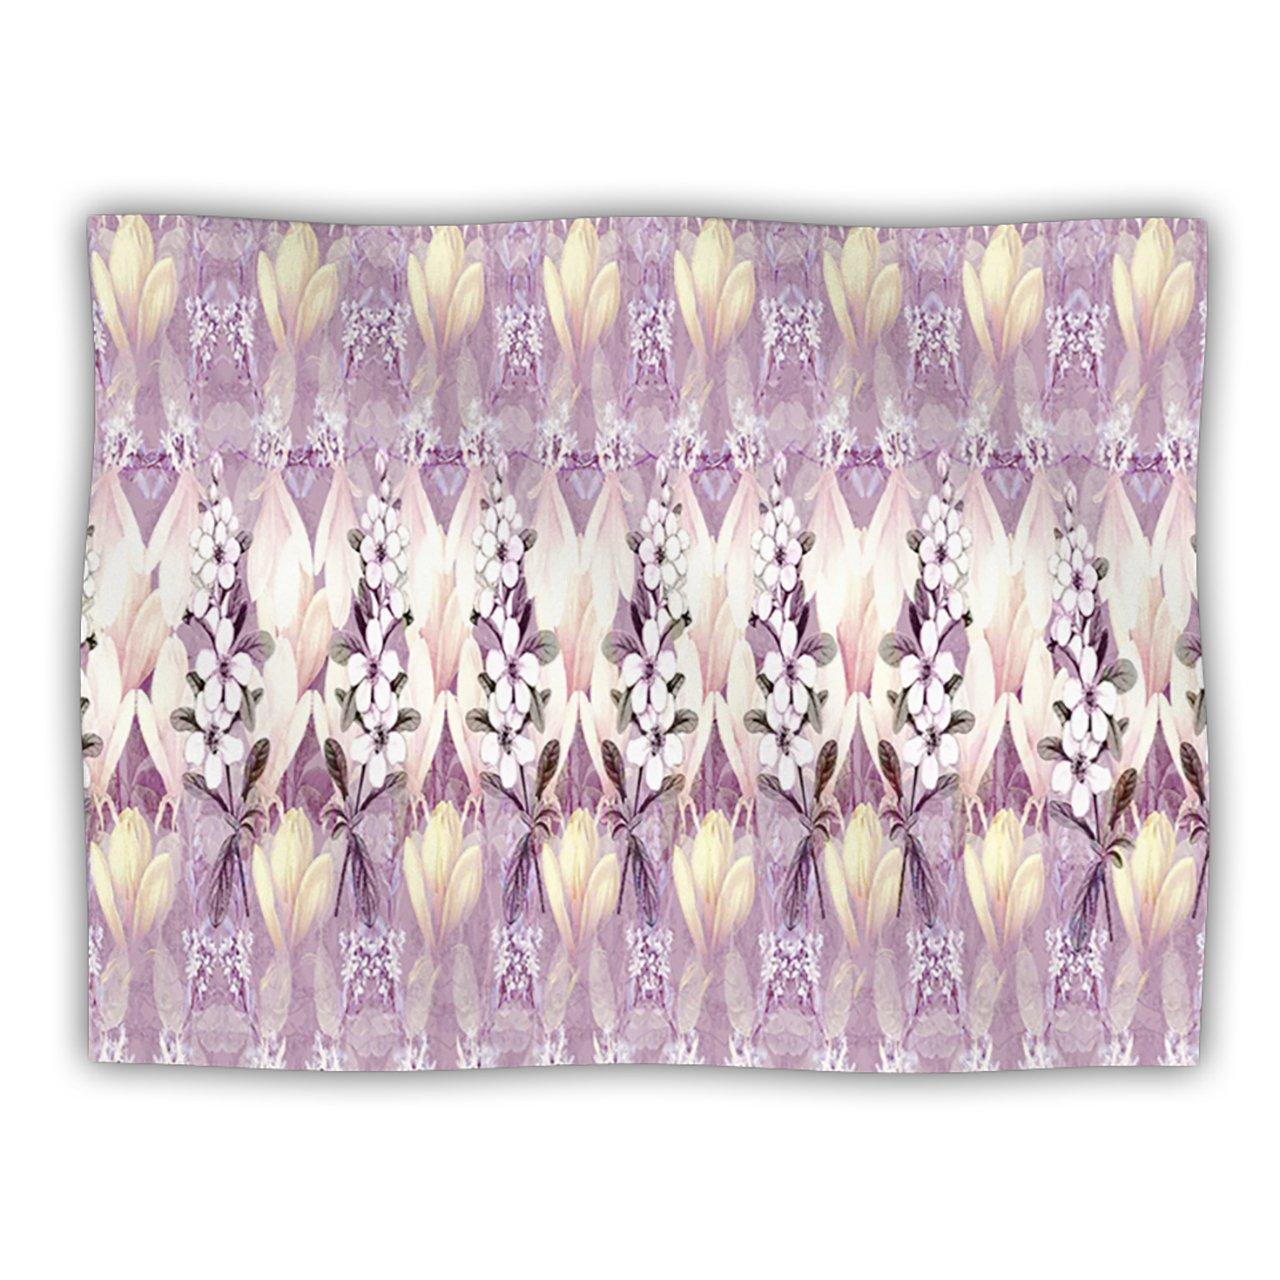 Kess InHouse Suzanne Carter Laurel85  Pink Purple Pet Dog Blanket, 40 by 30-Inch